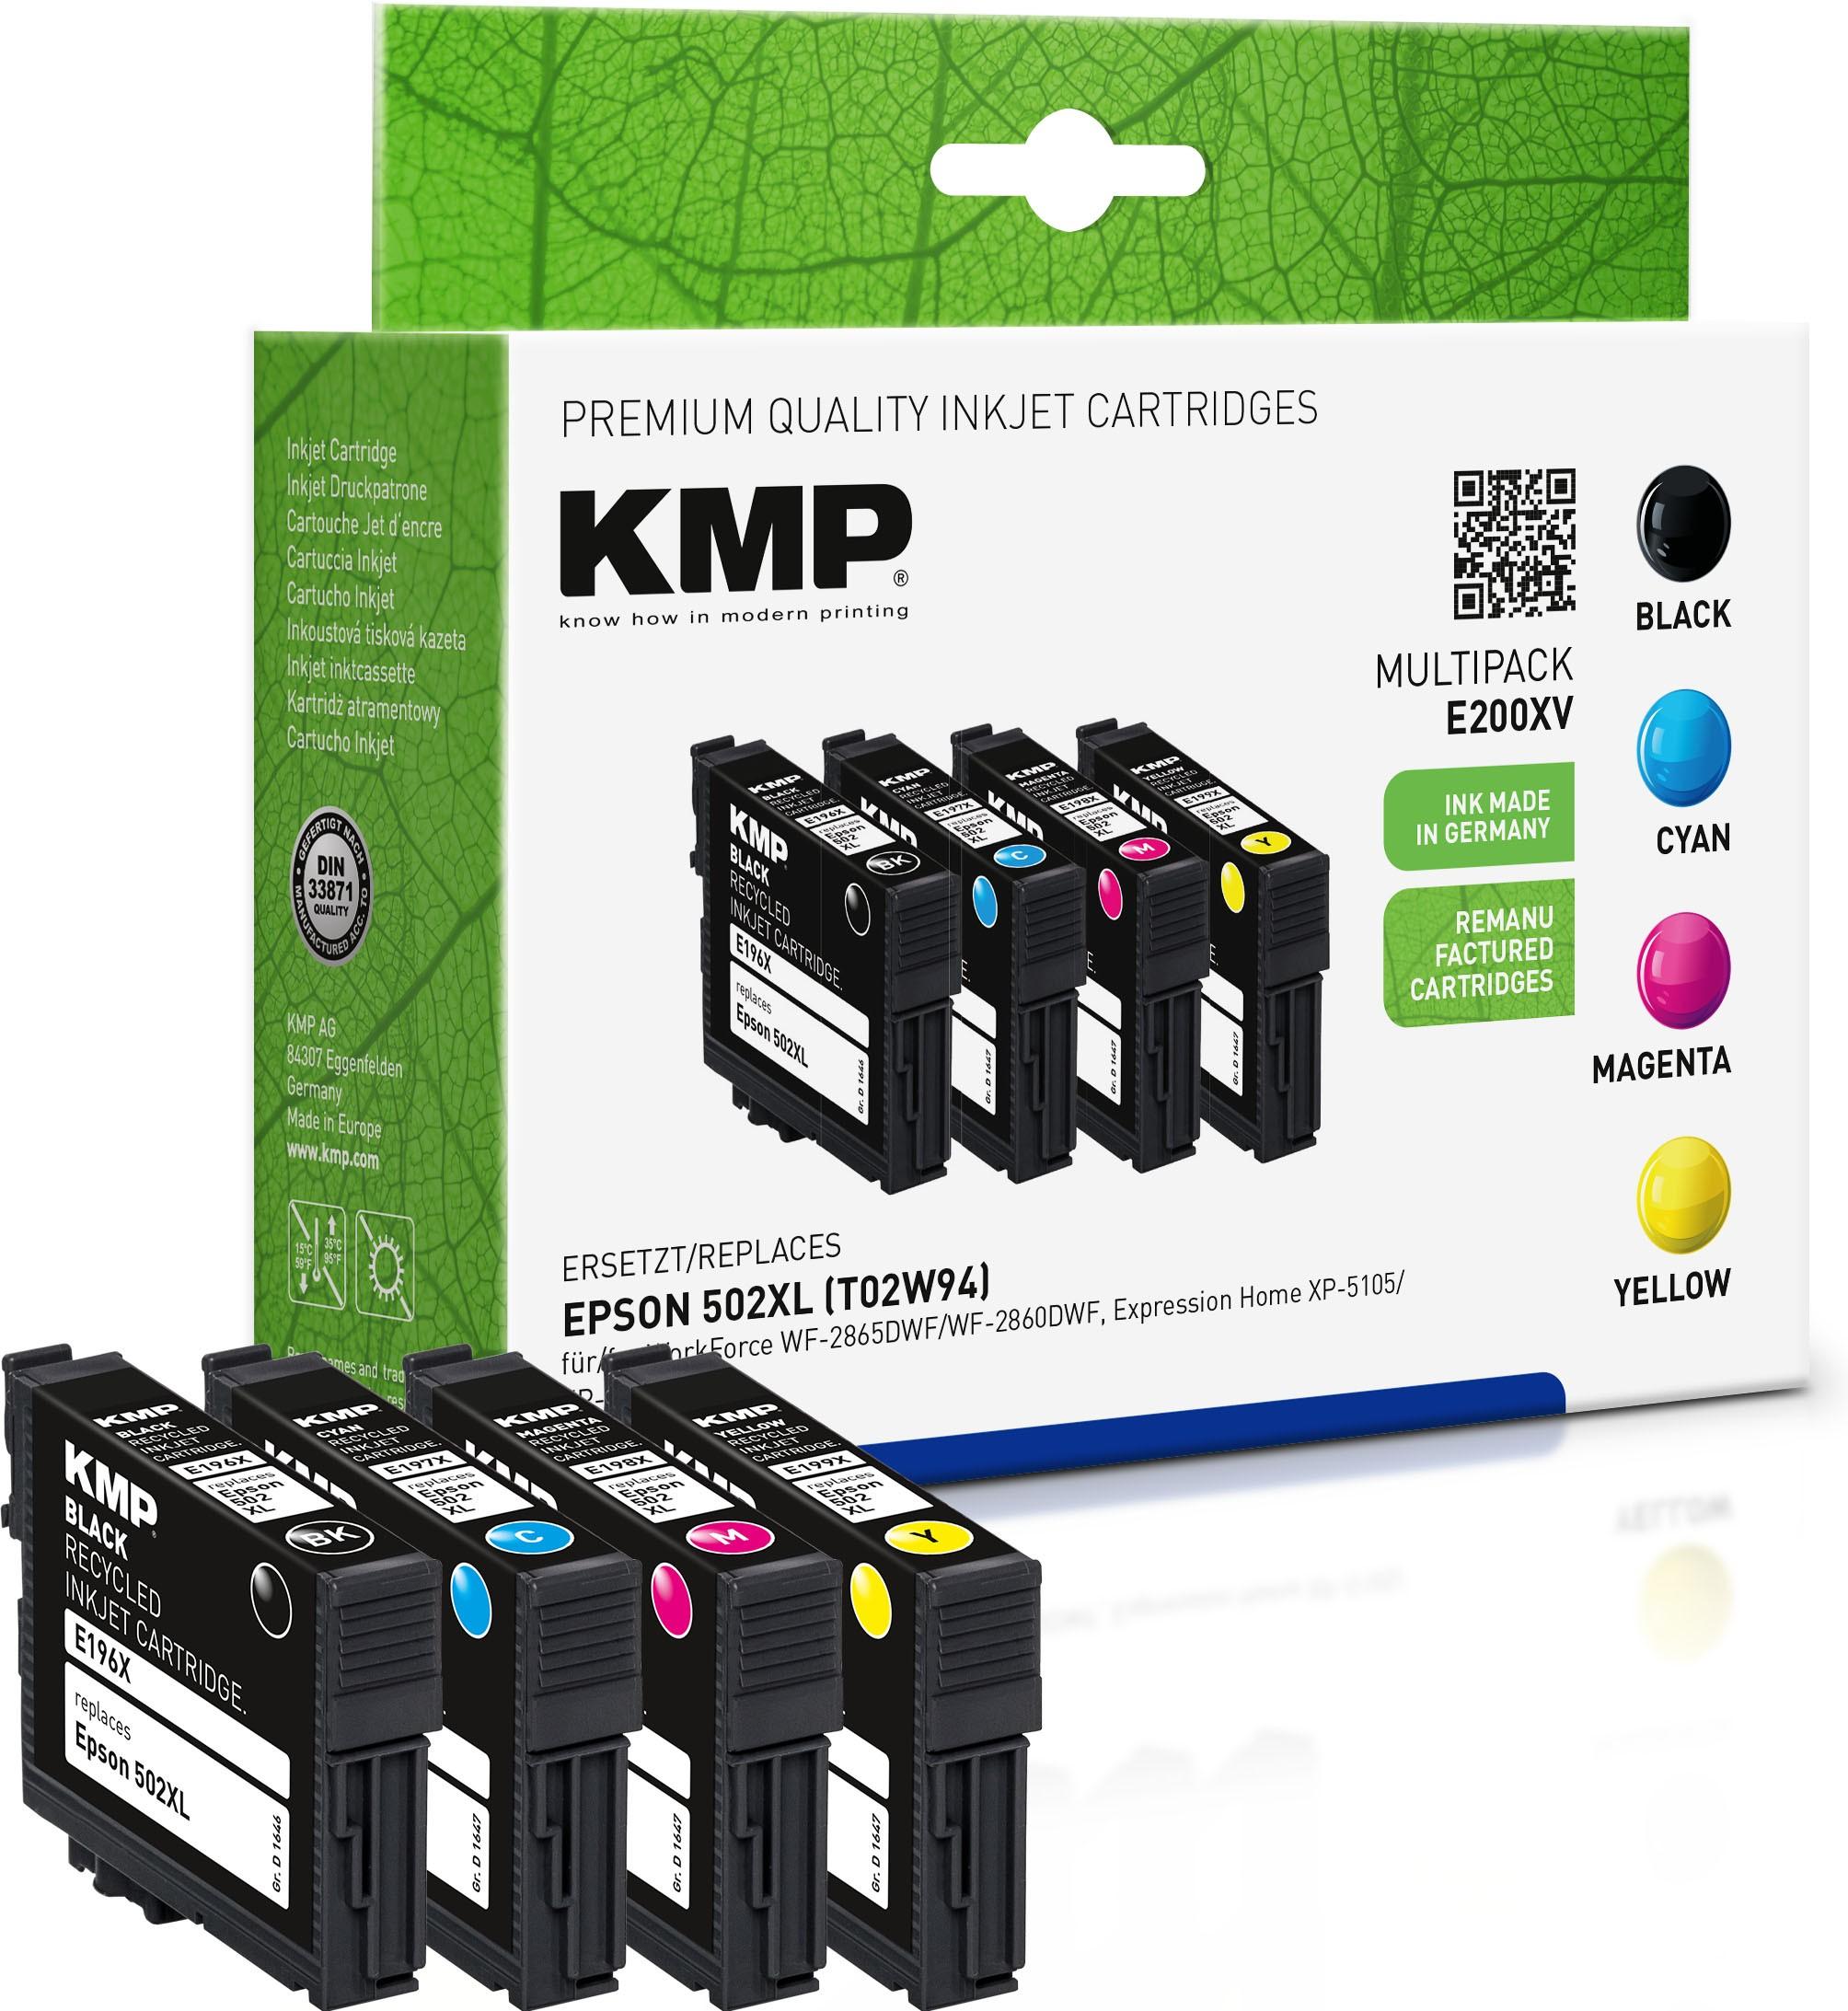 KMP Multipack E196XV schwarz, cyan, magenta, gelb Tintenpatronen ersetzen Epson WorkForce 502XL (T0W